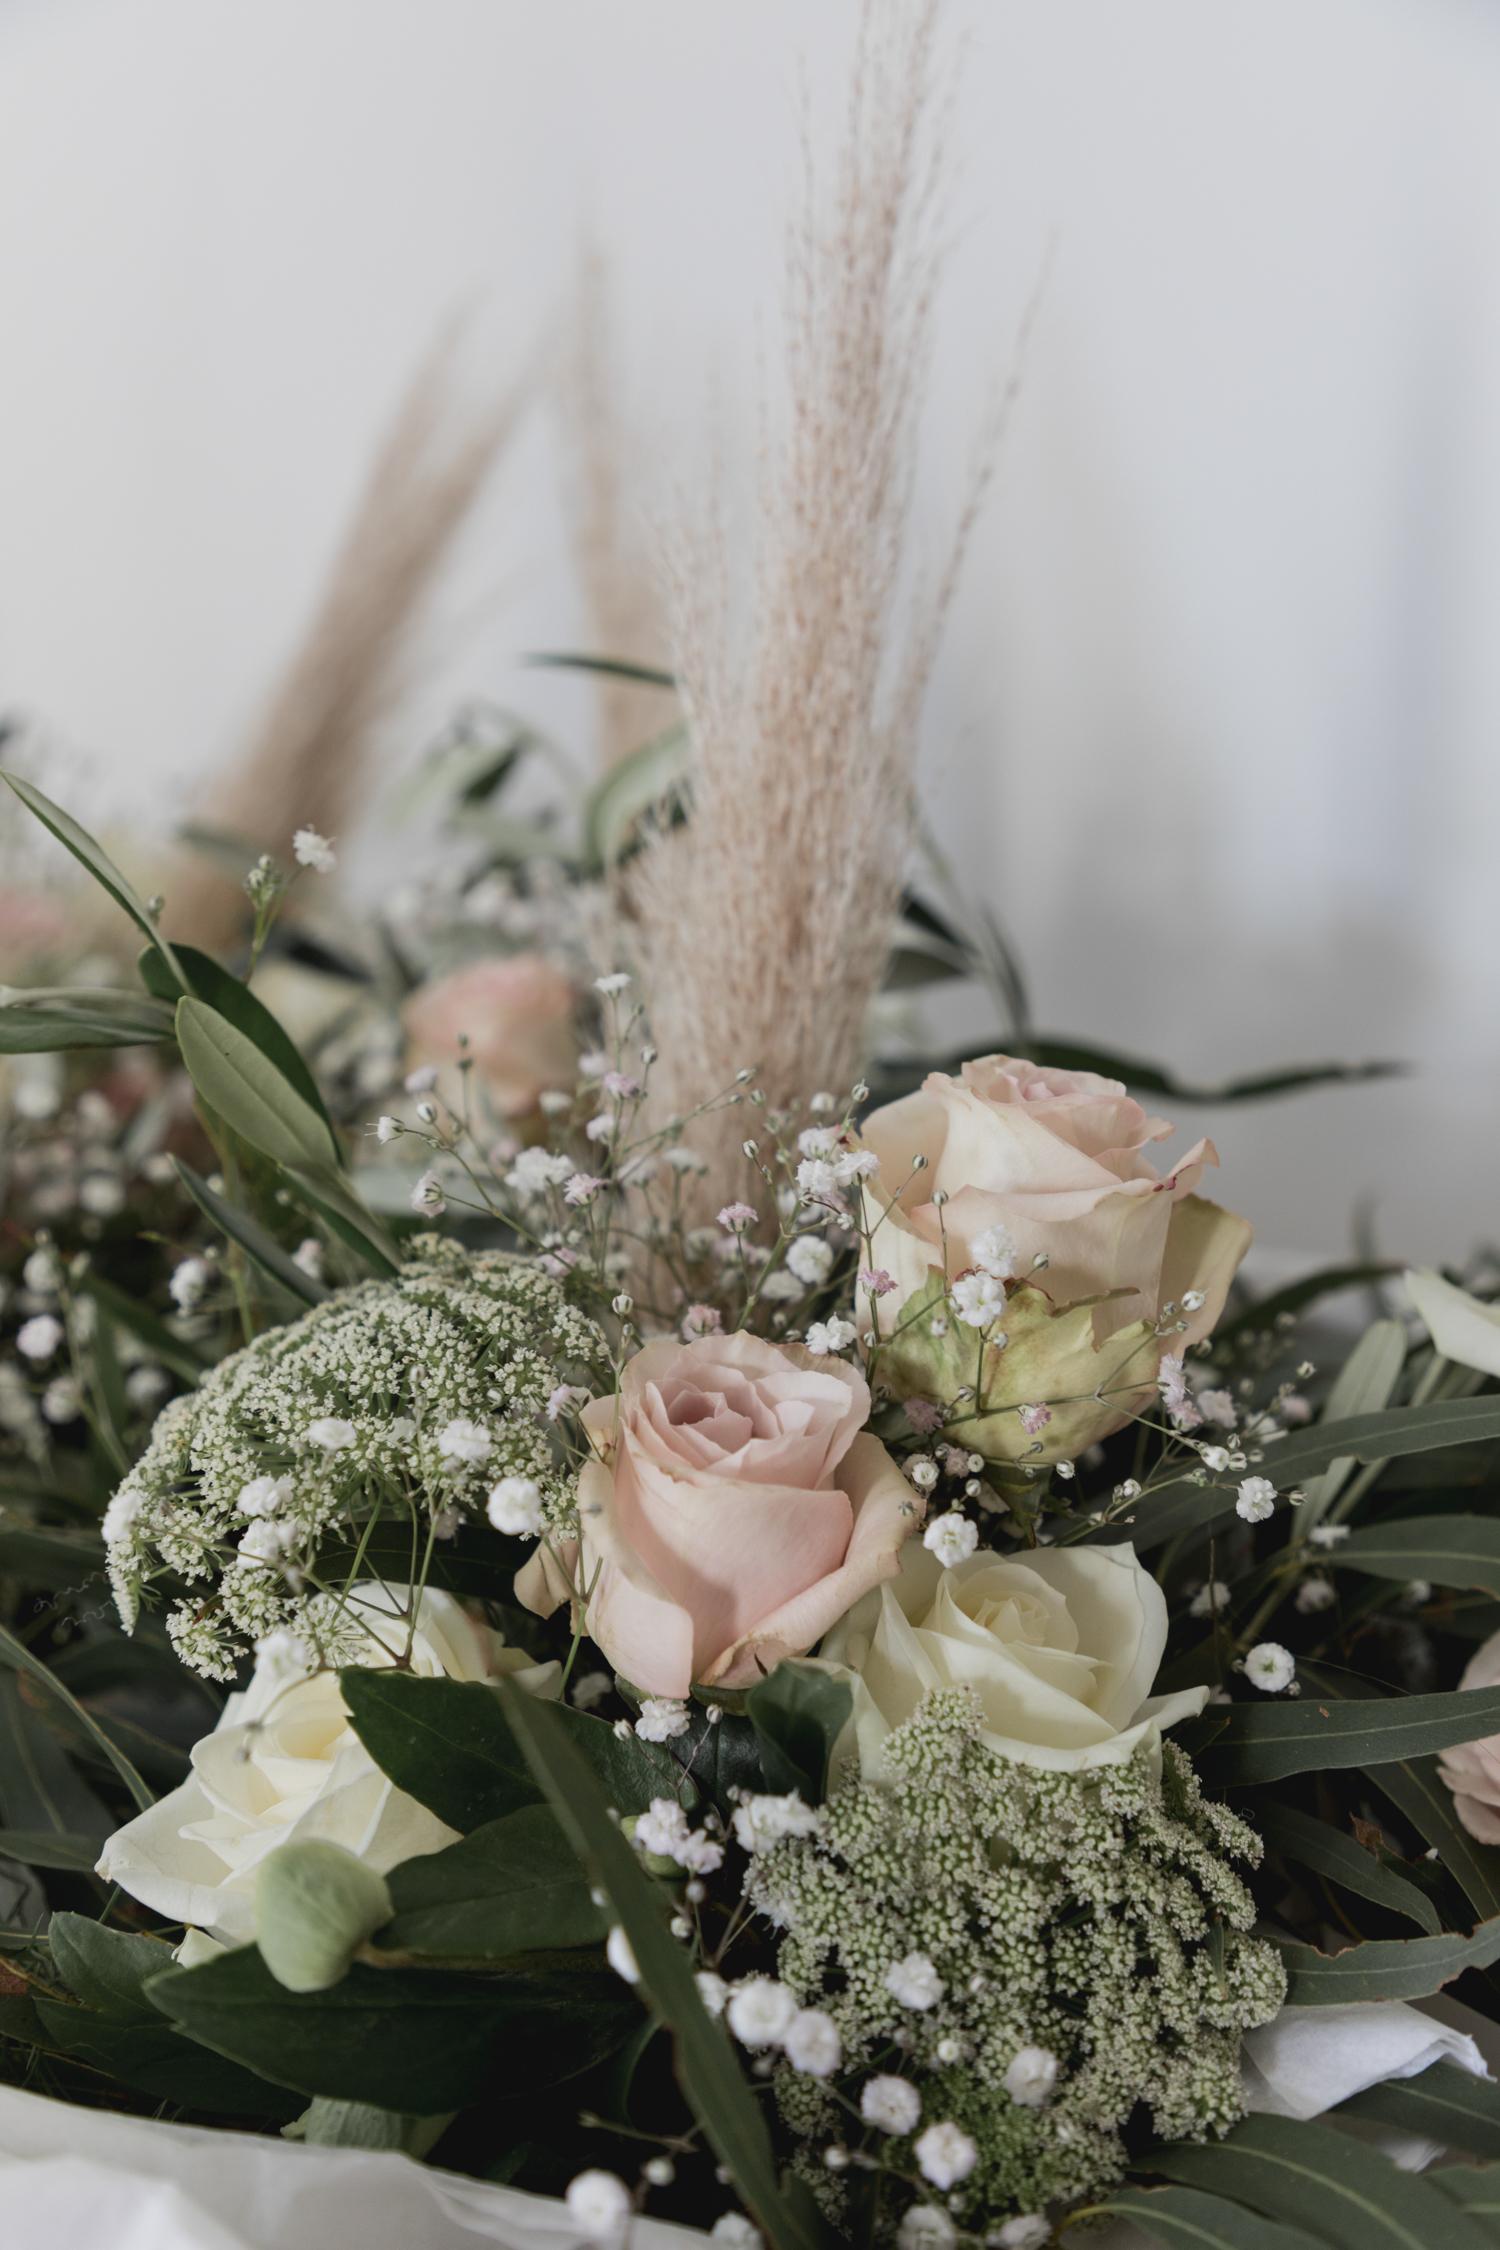 wedding-at-the-red-barn-new-zealand-wedding-photographer-florist-boutique.jpg